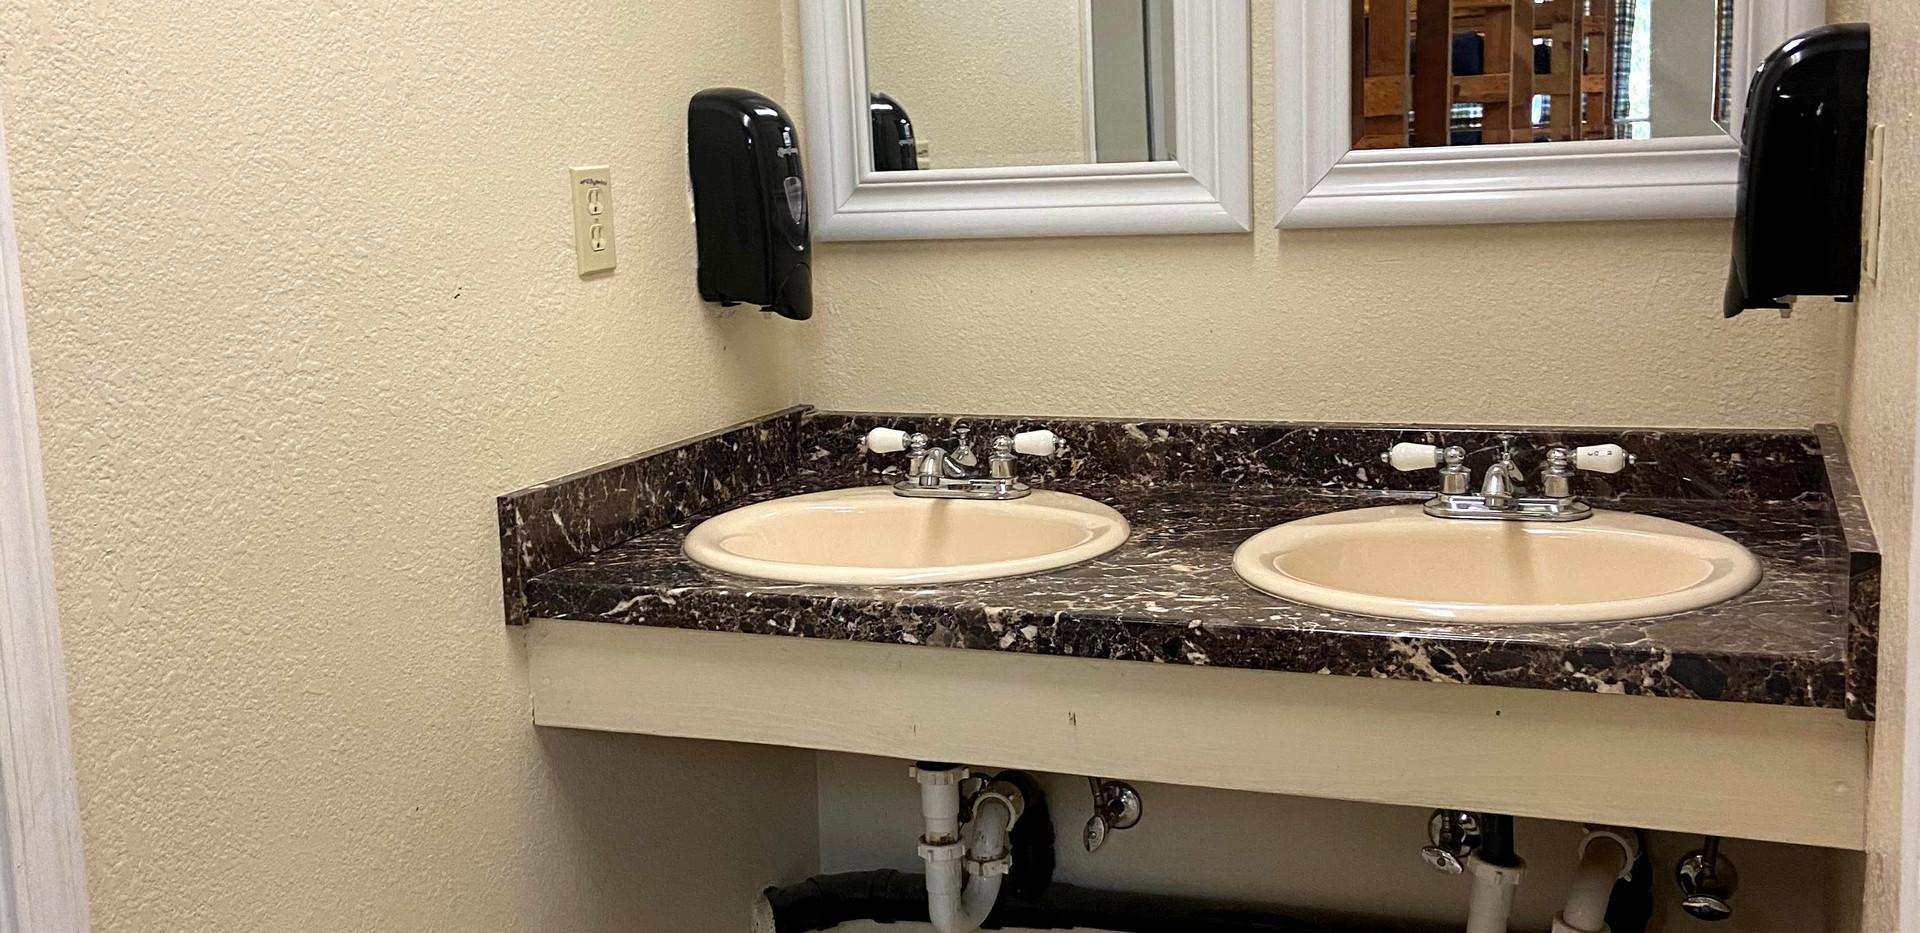 Juniper 1 Sinks